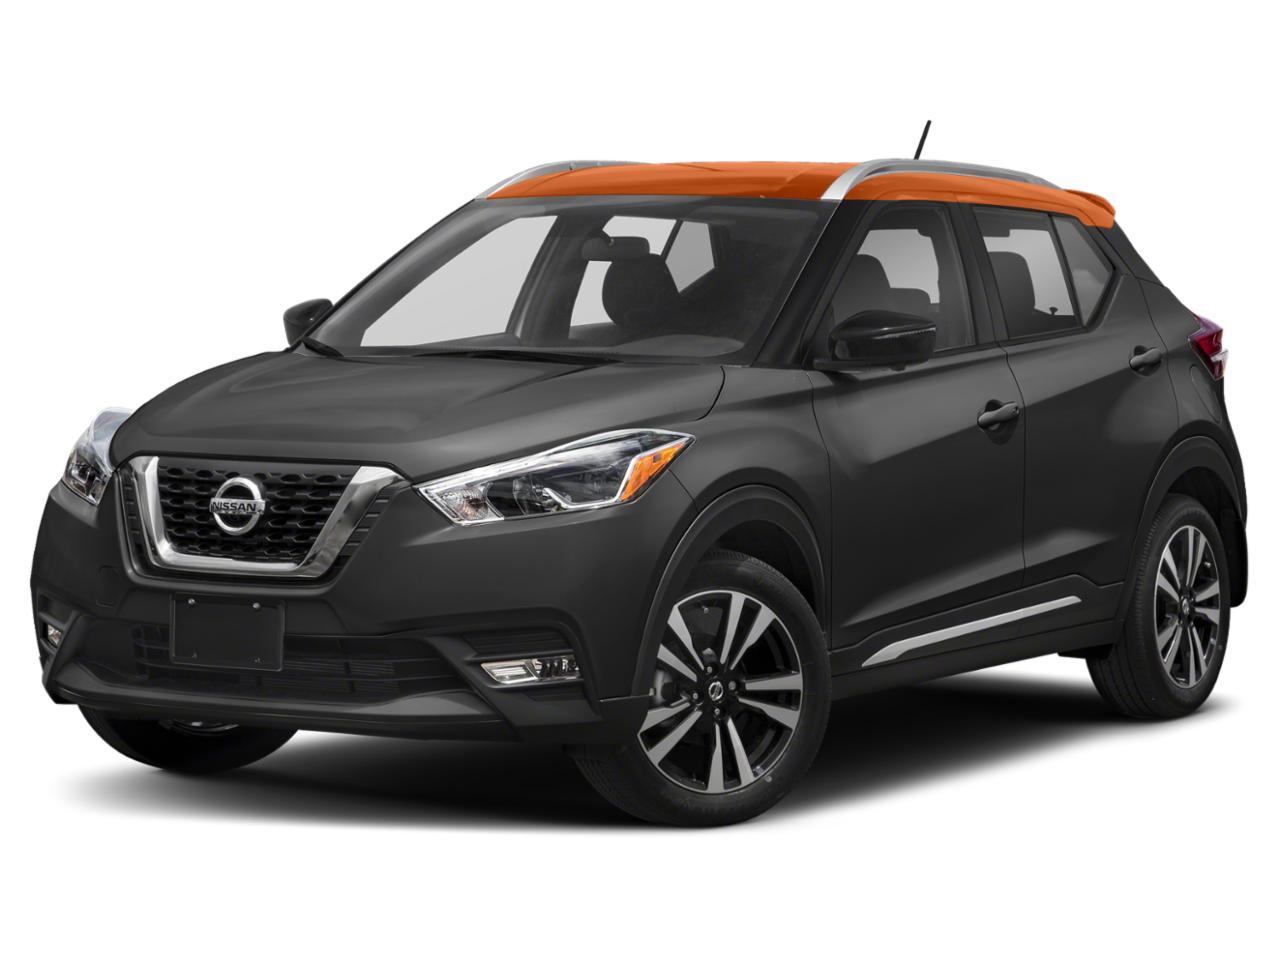 2019 Nissan Kicks Vehicle Photo in Corpus Christi, TX 78411